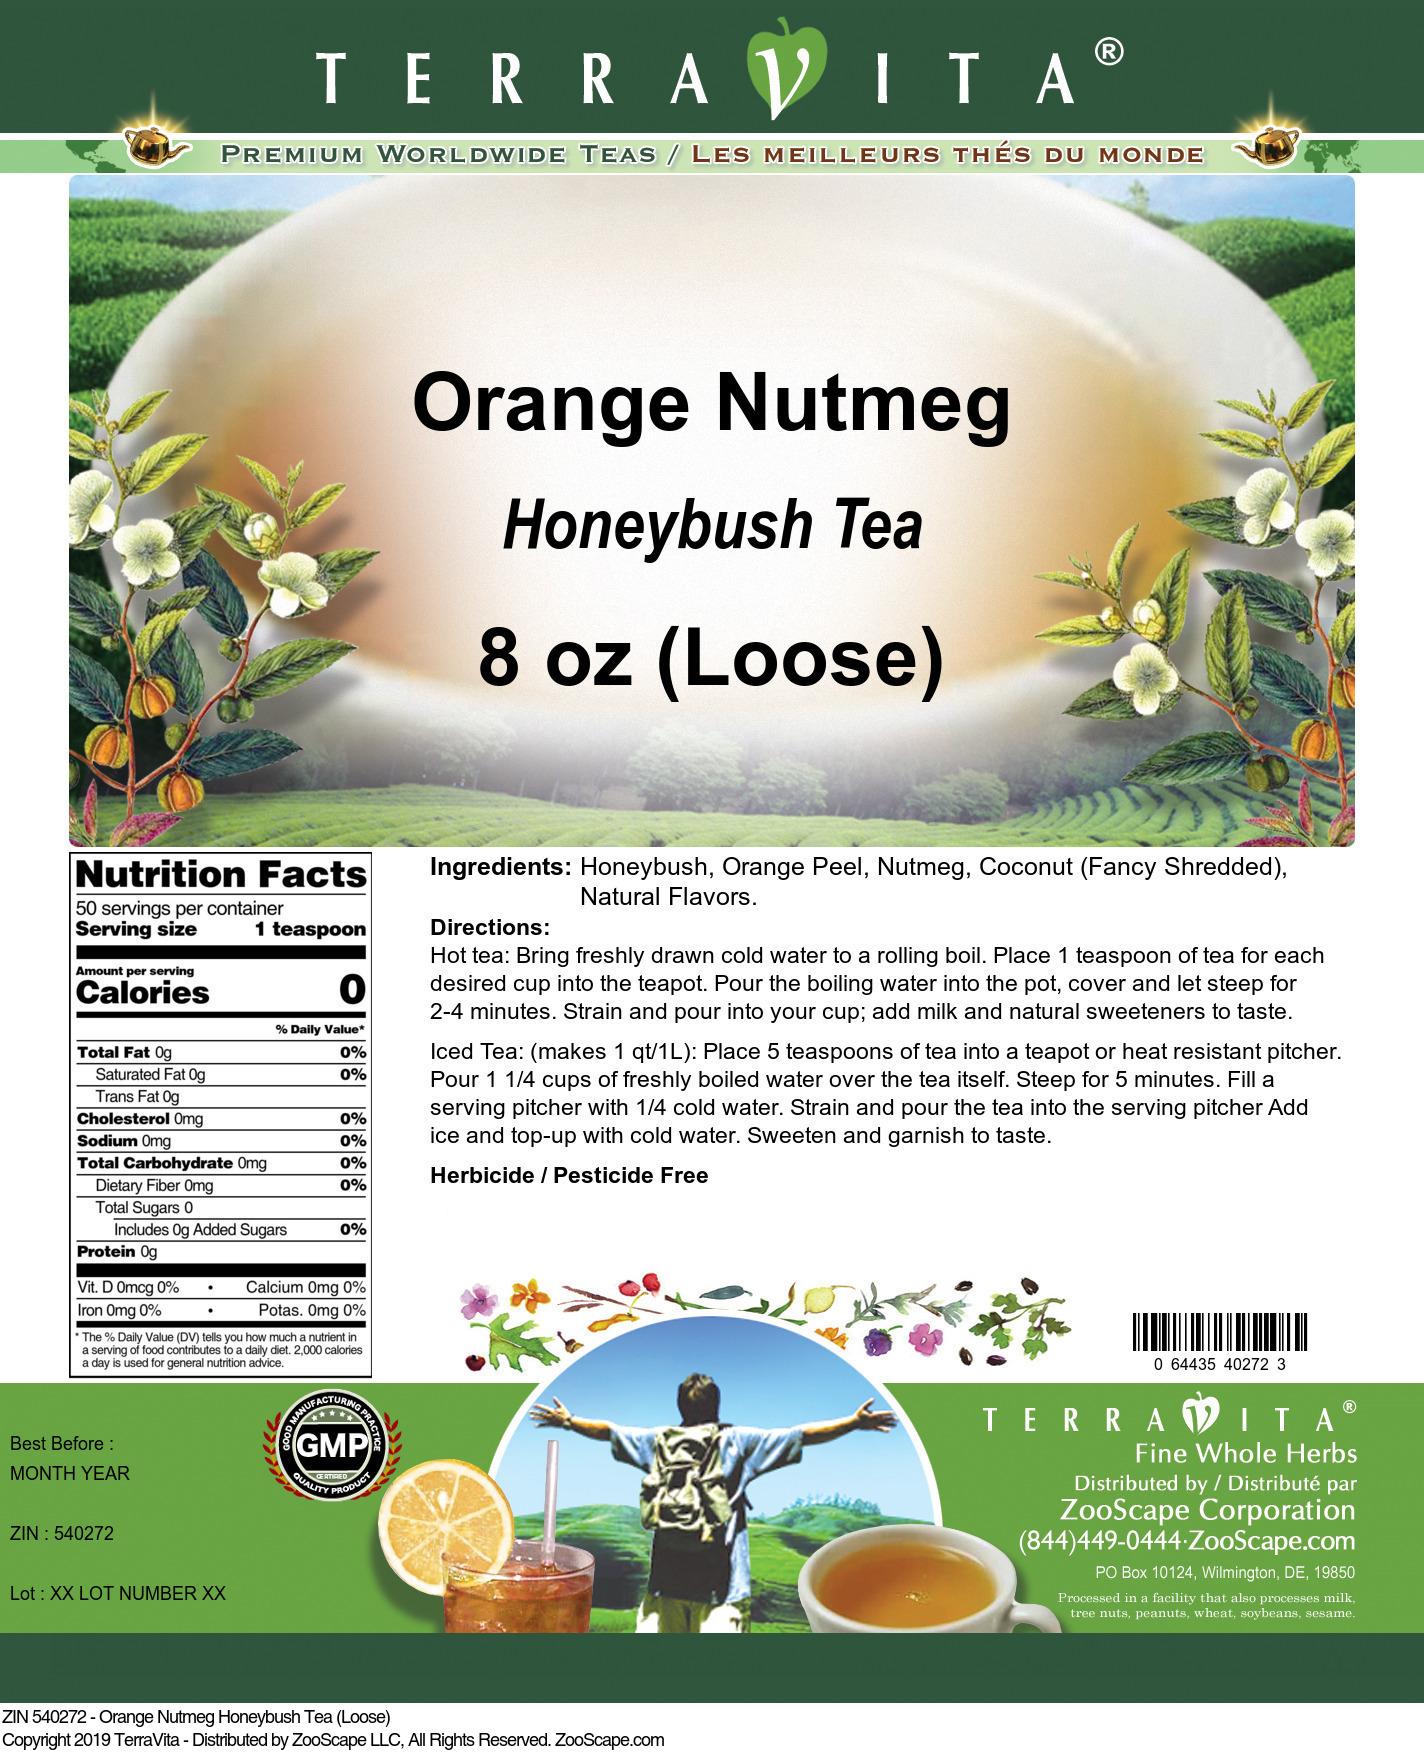 Orange Nutmeg Honeybush Tea